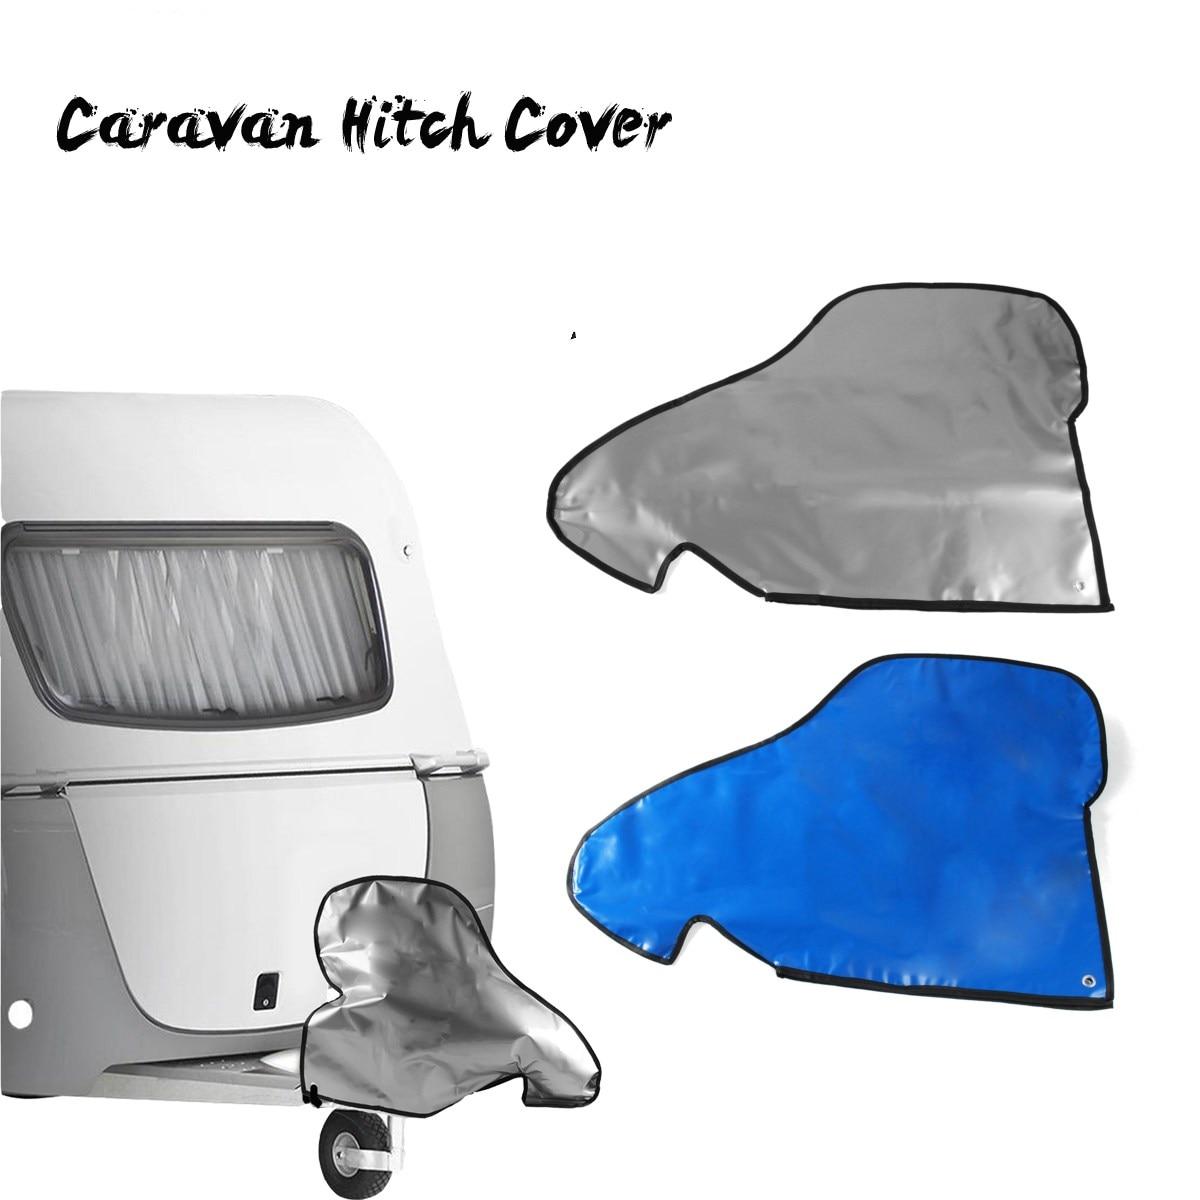 Hitch Cover Coupling Lock Trailer Tow Ball Waterproof  PVC Material For Caravan